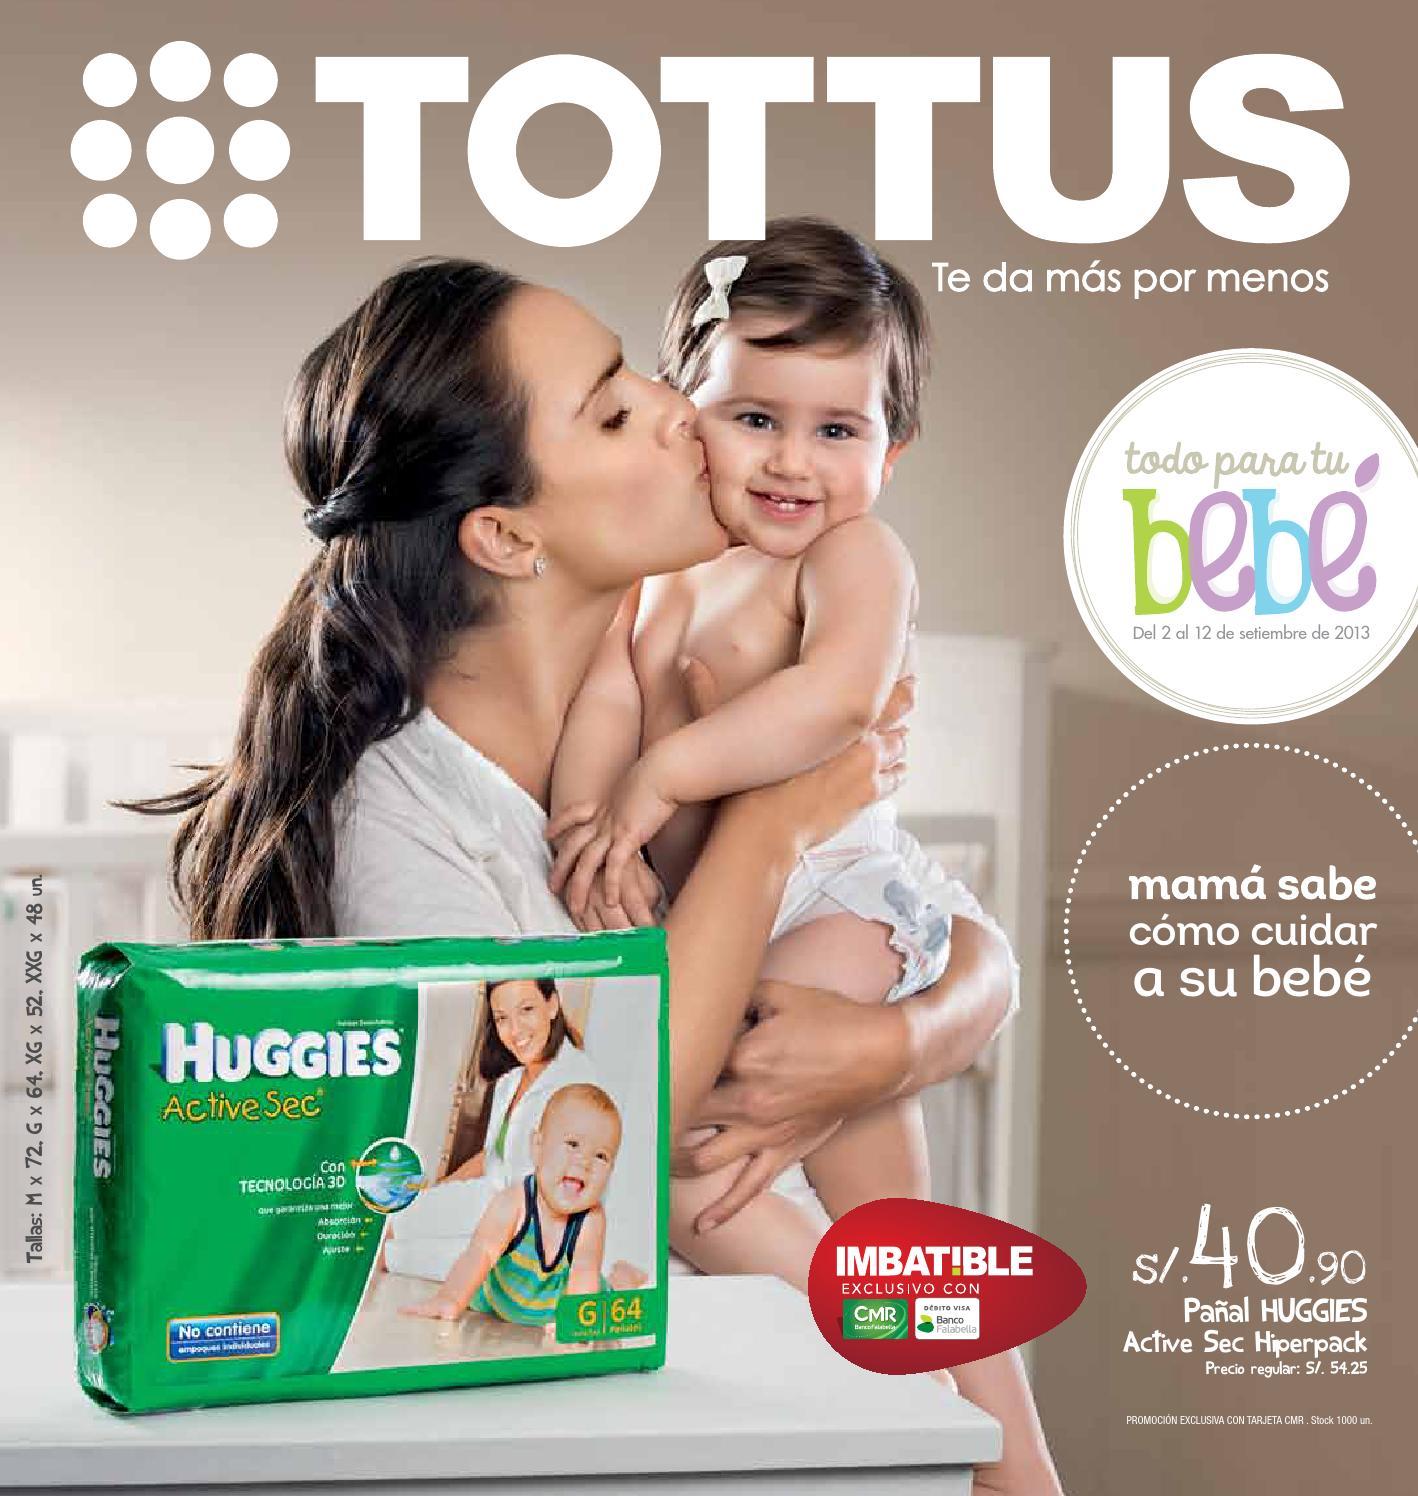 2804bd69d 20130902 suplemento tottus todo para tu bebe by Victor Martin Bendezu -  issuu